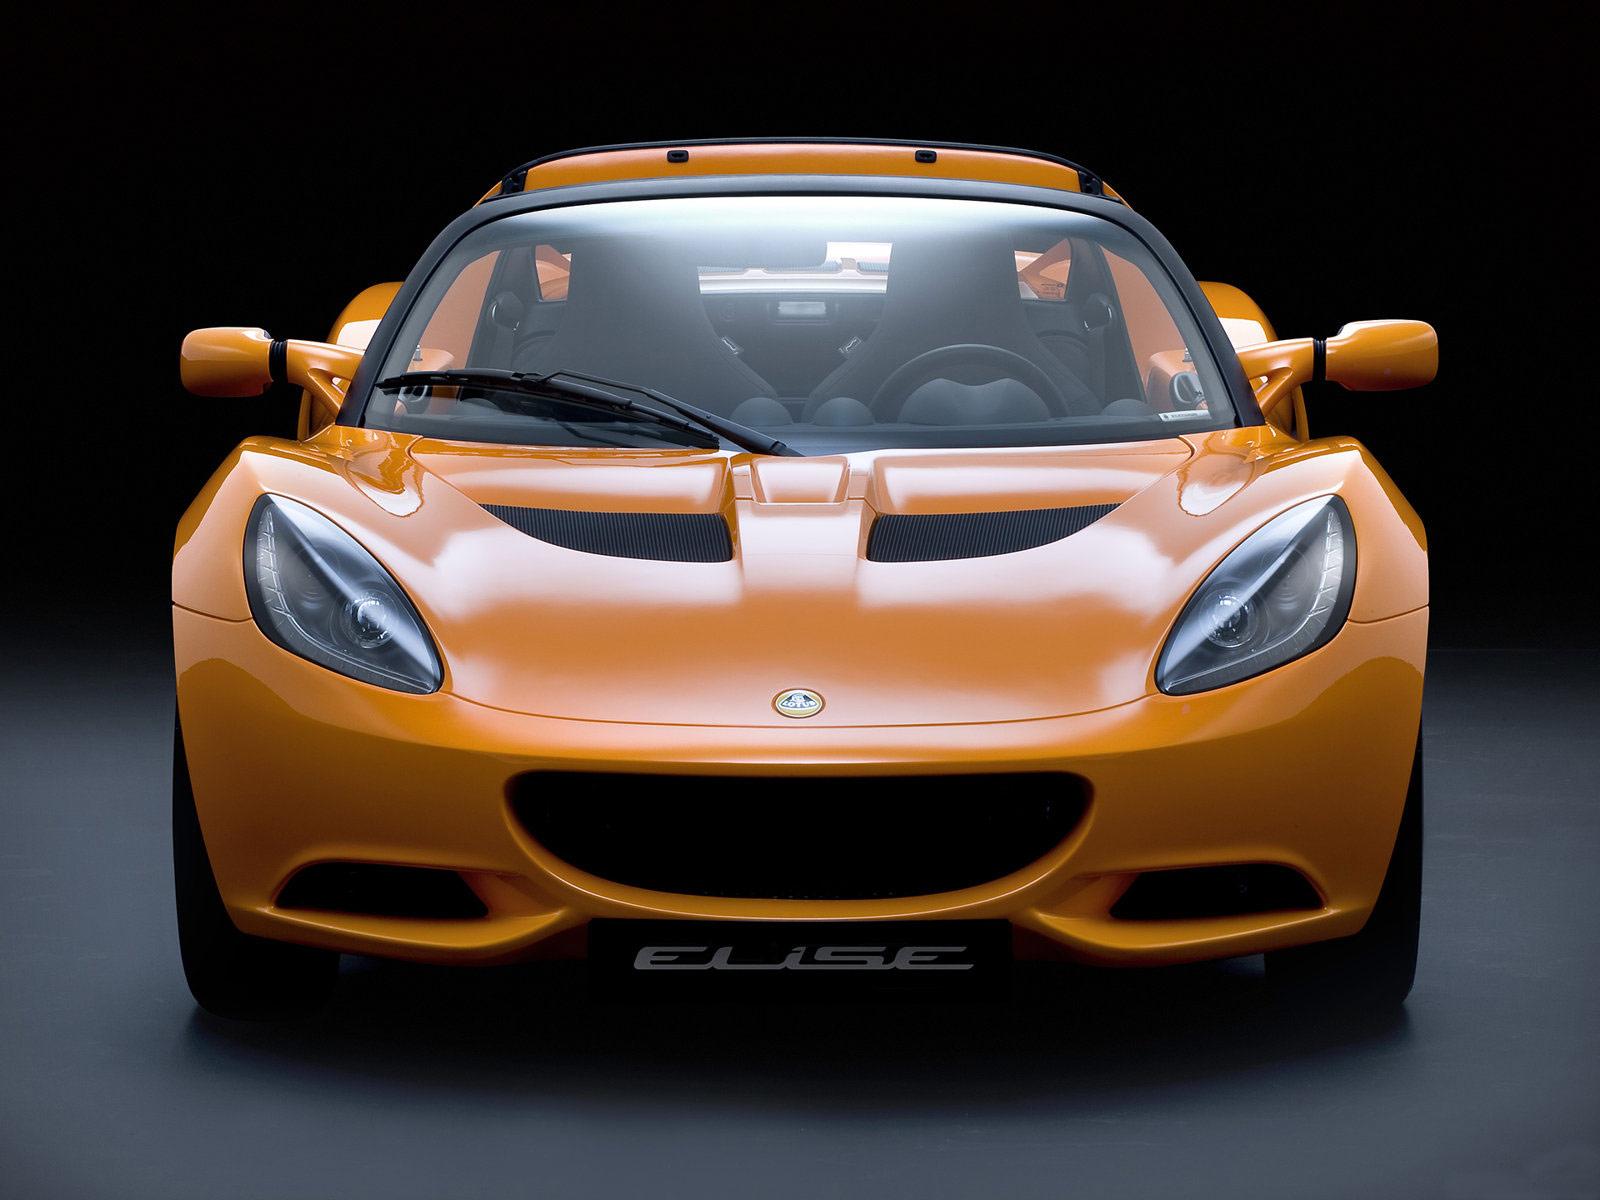 2011 LOTUS Elise Wallpapers, Car Review